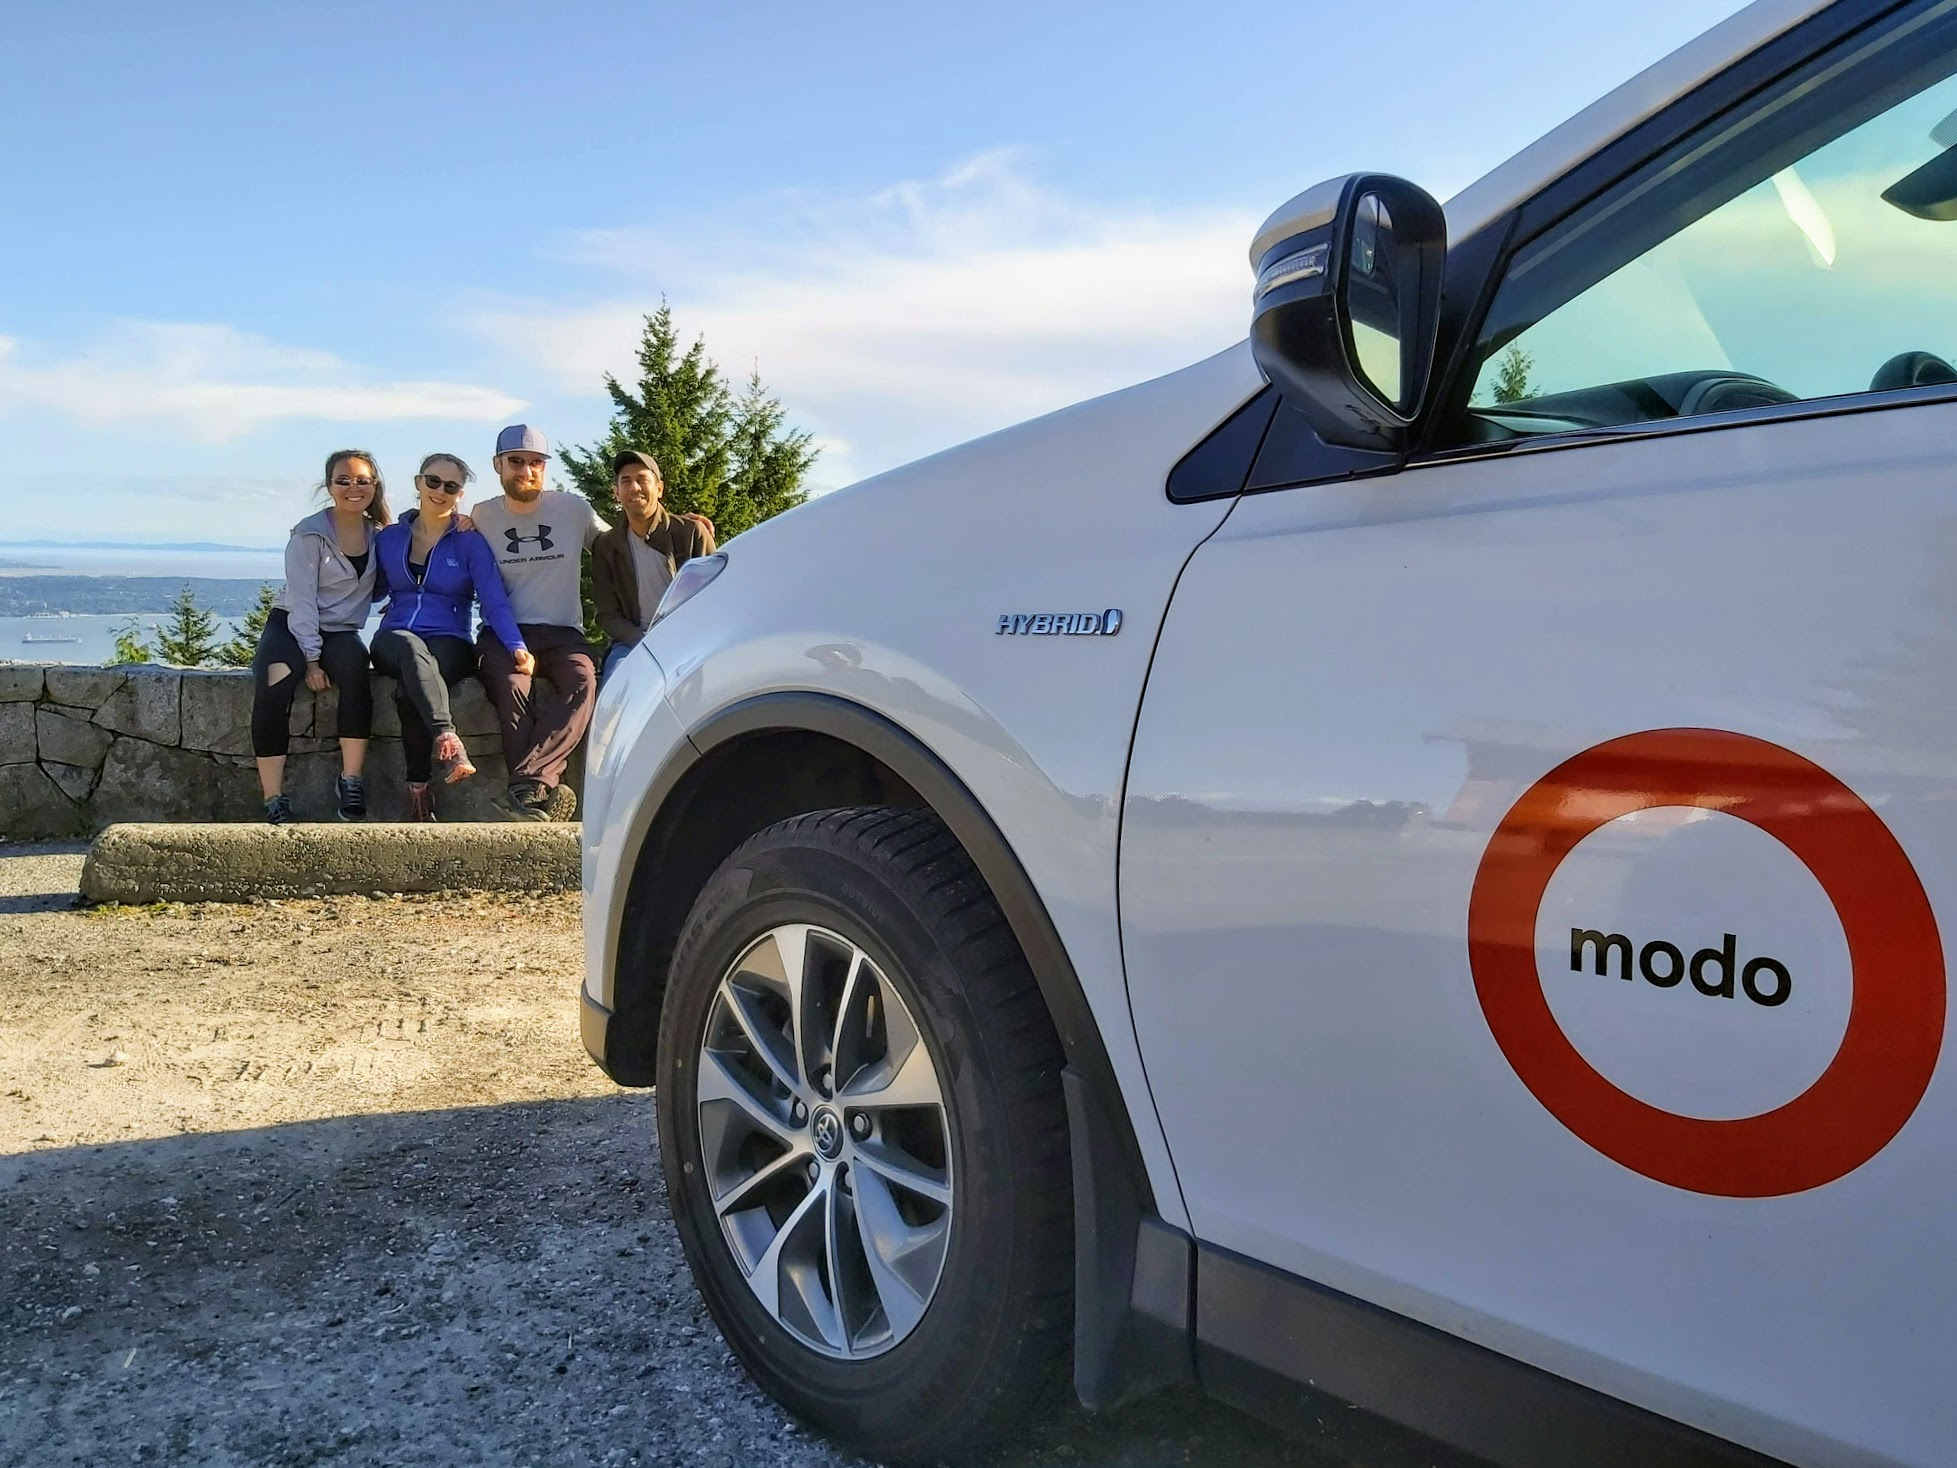 Modo group adventure